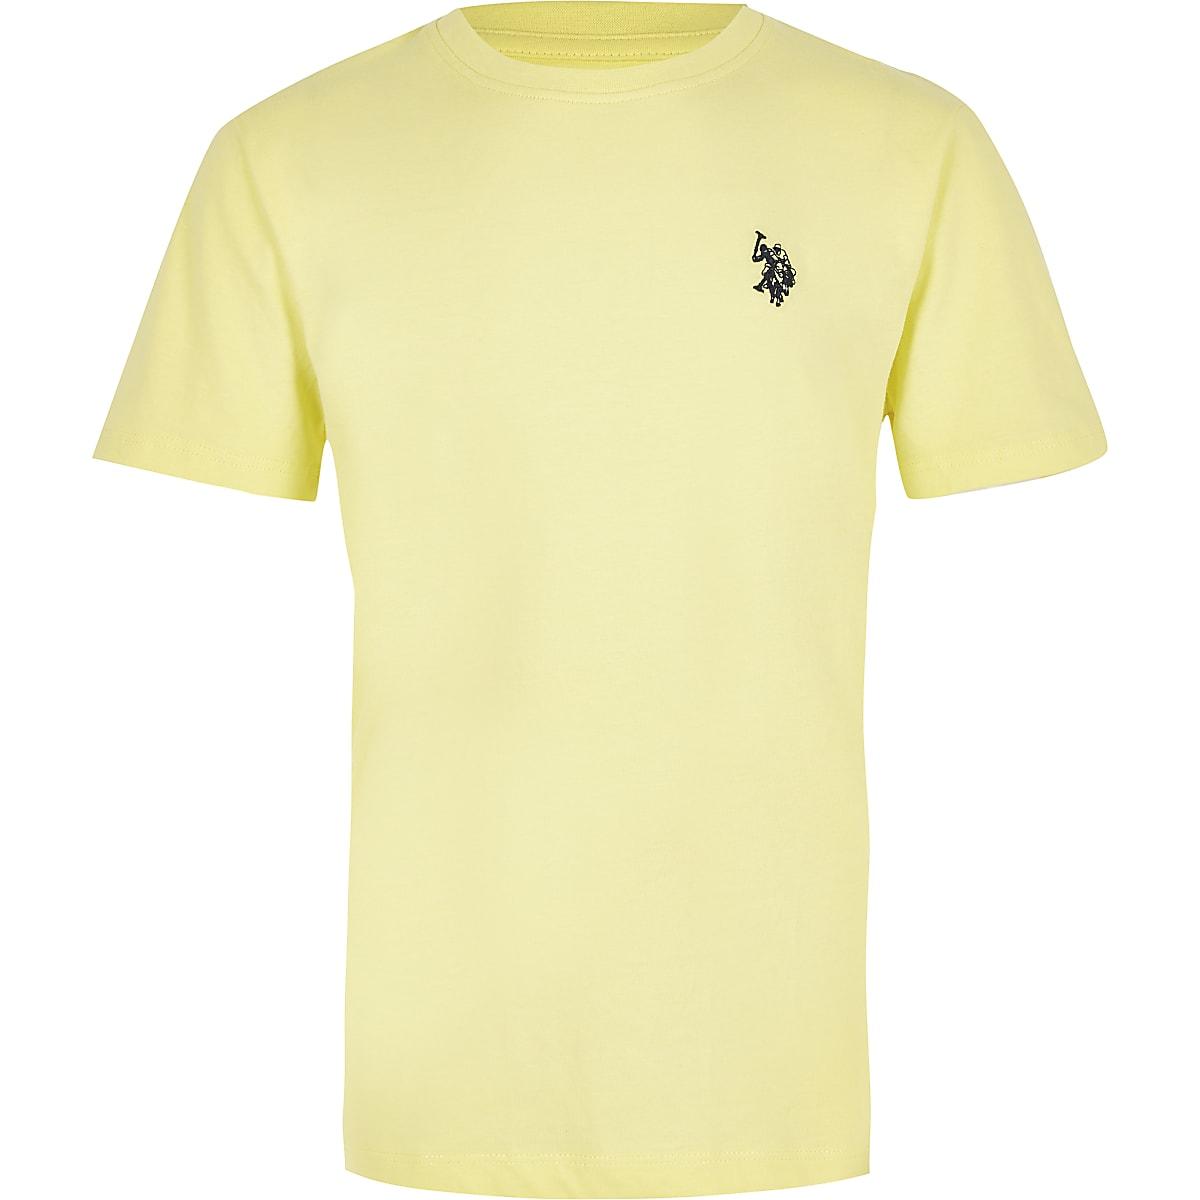 Boys yellow U.S. Polo Assn.T-shirt